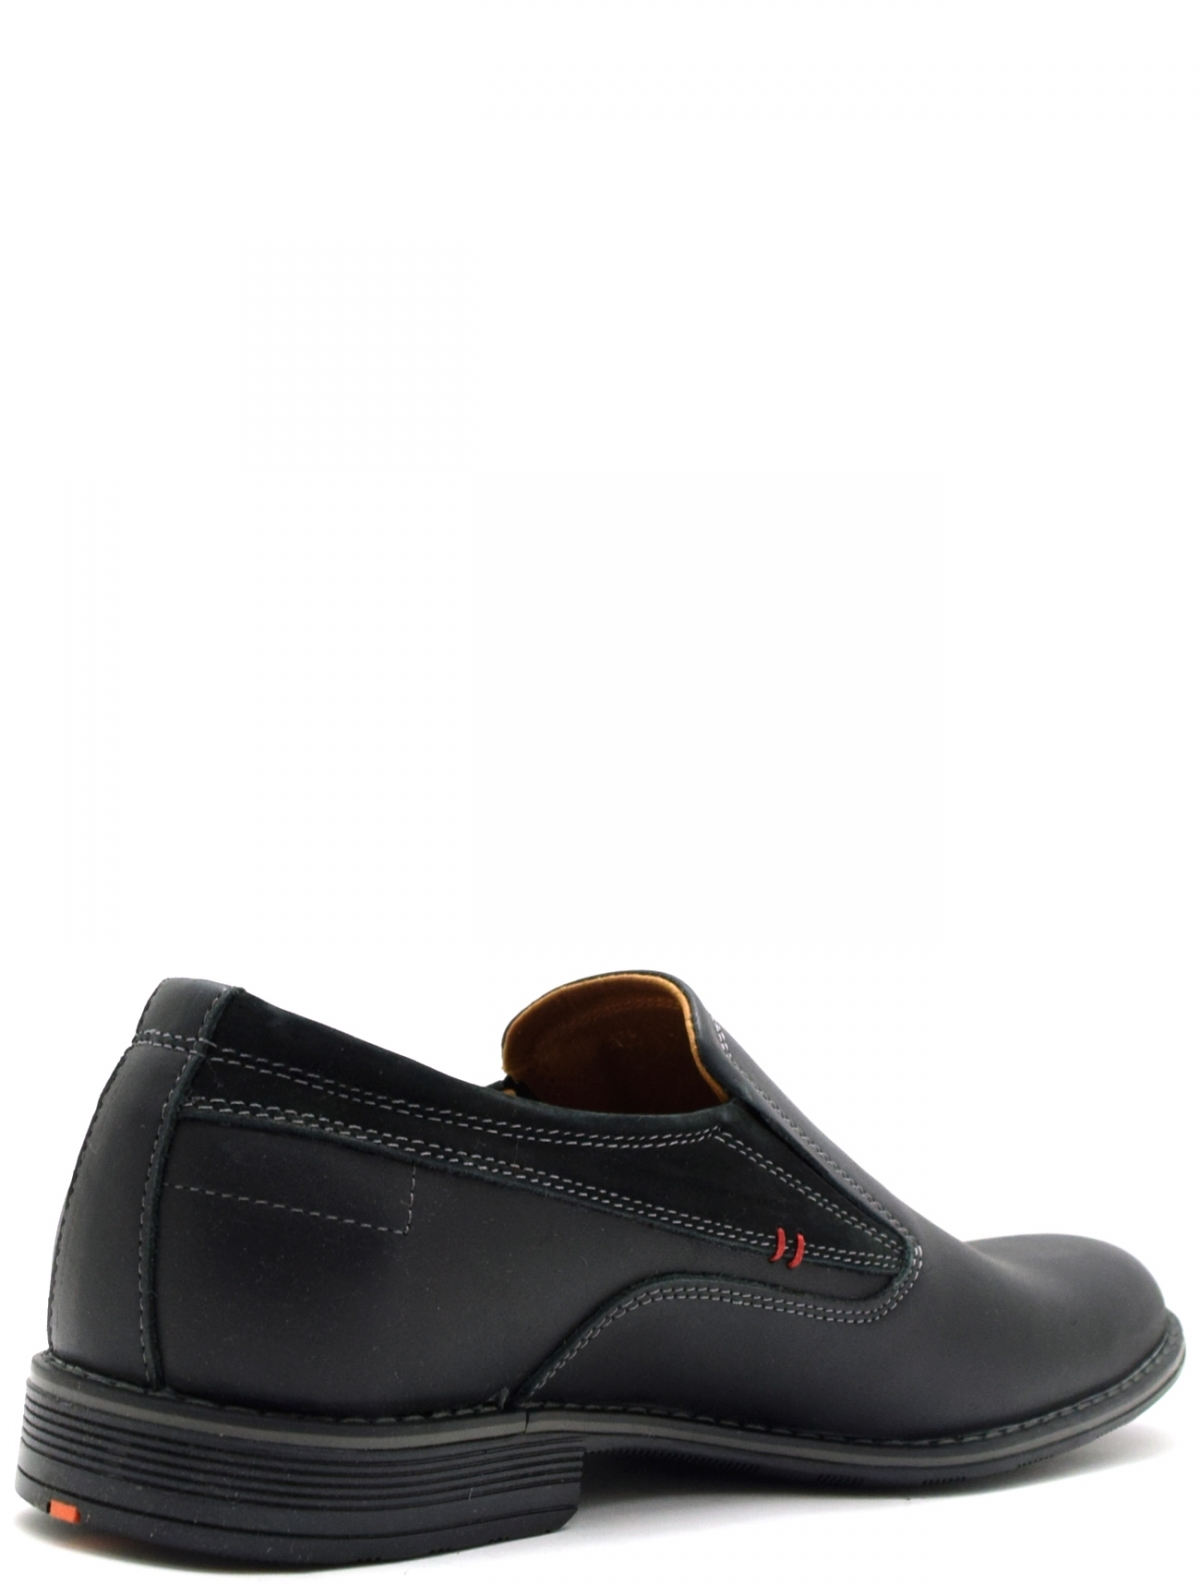 BERTOLI 138/49 мужские туфли